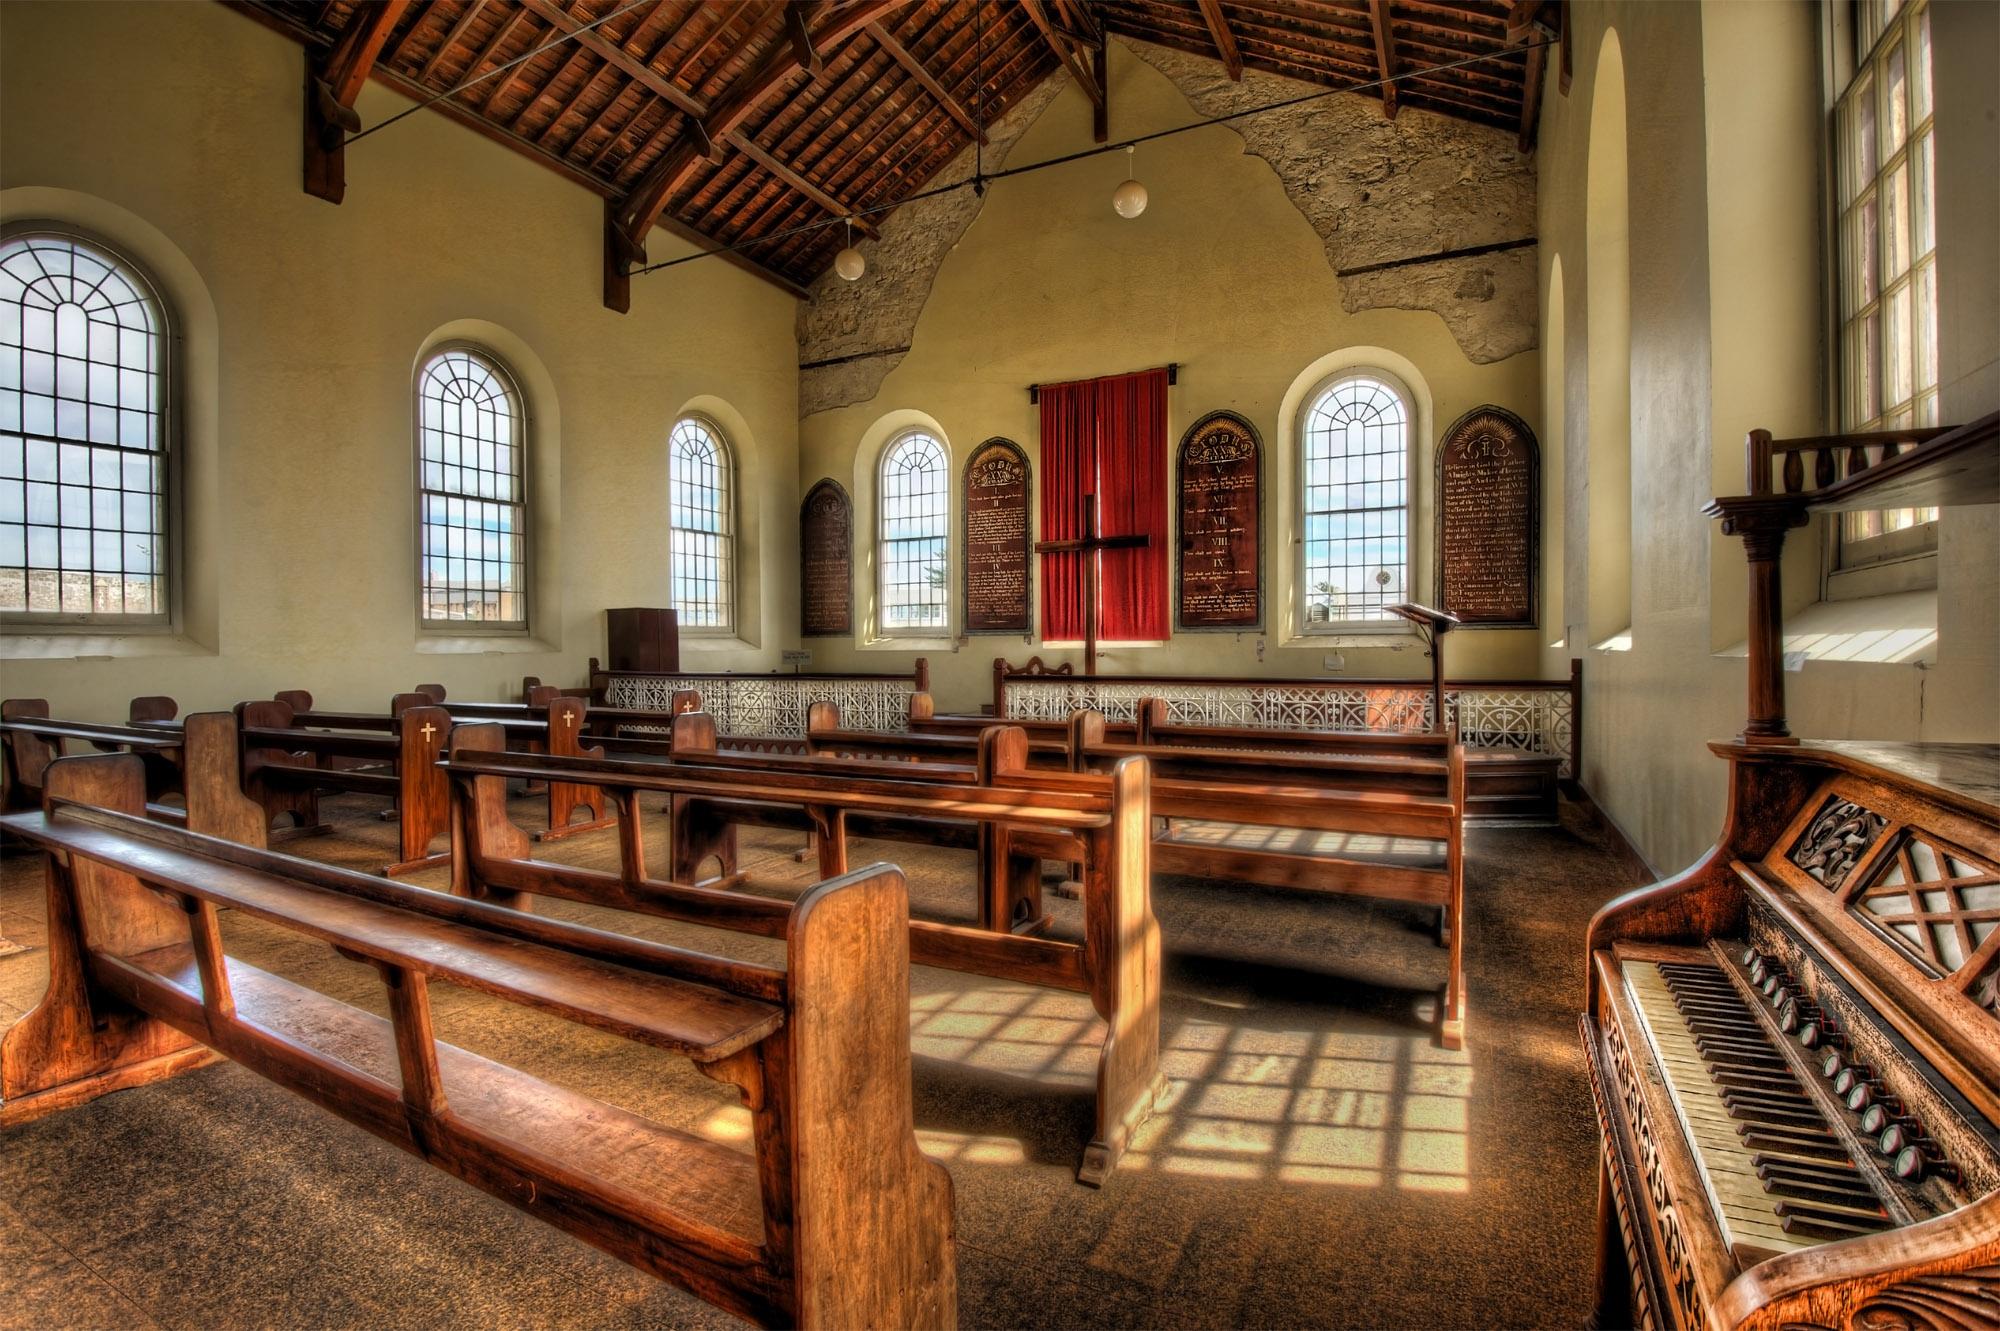 fremantle prison church onone